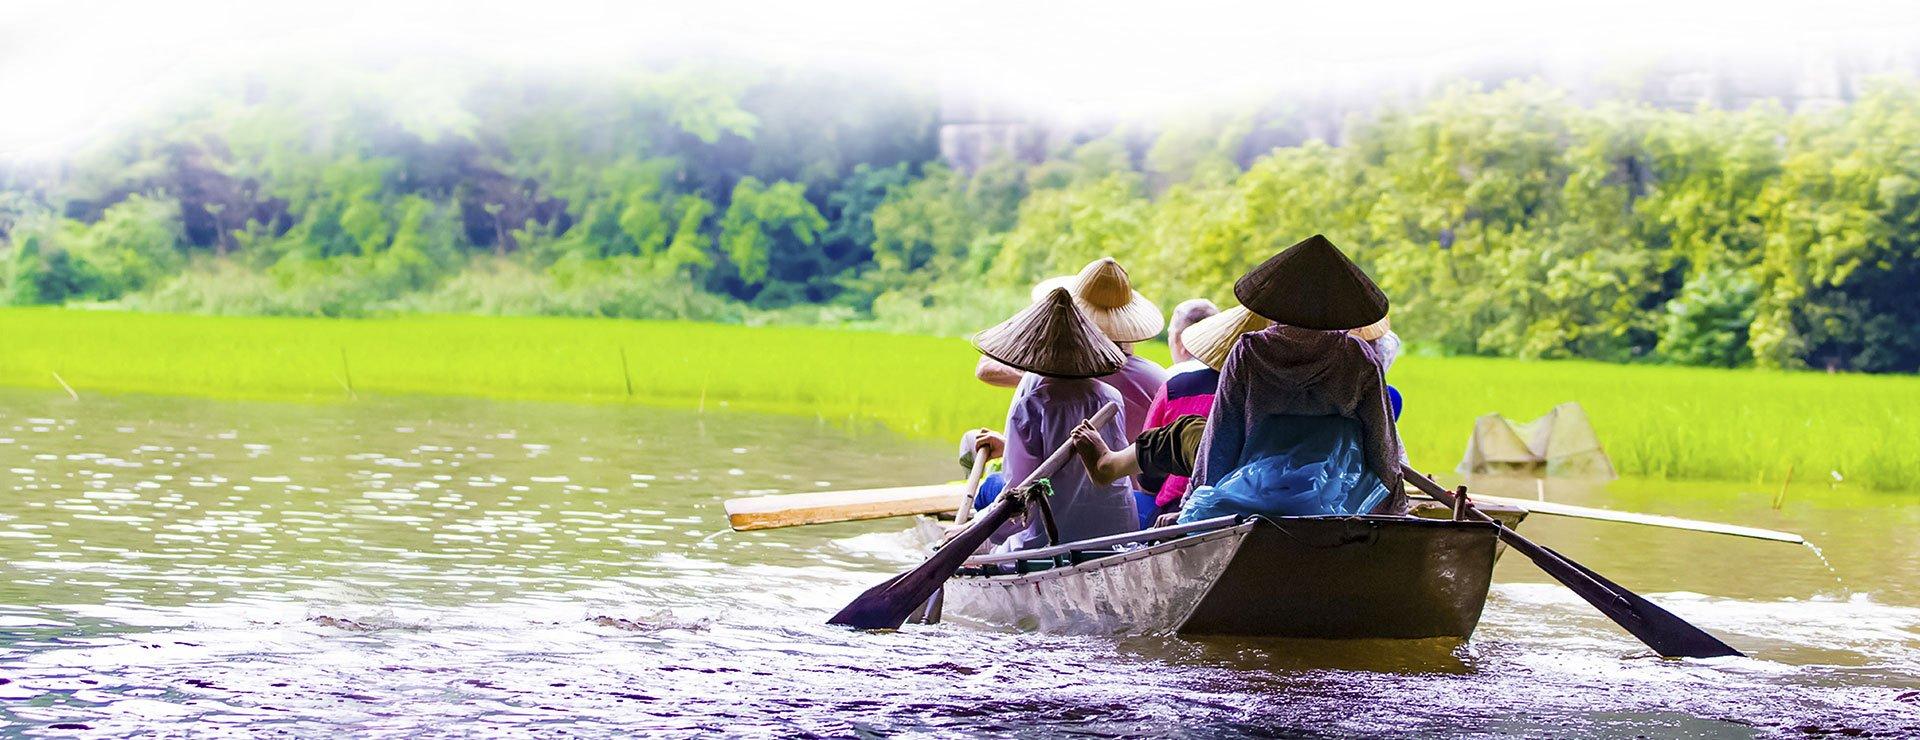 Top 10 Things to Do in Ninh Binh of Vietnam